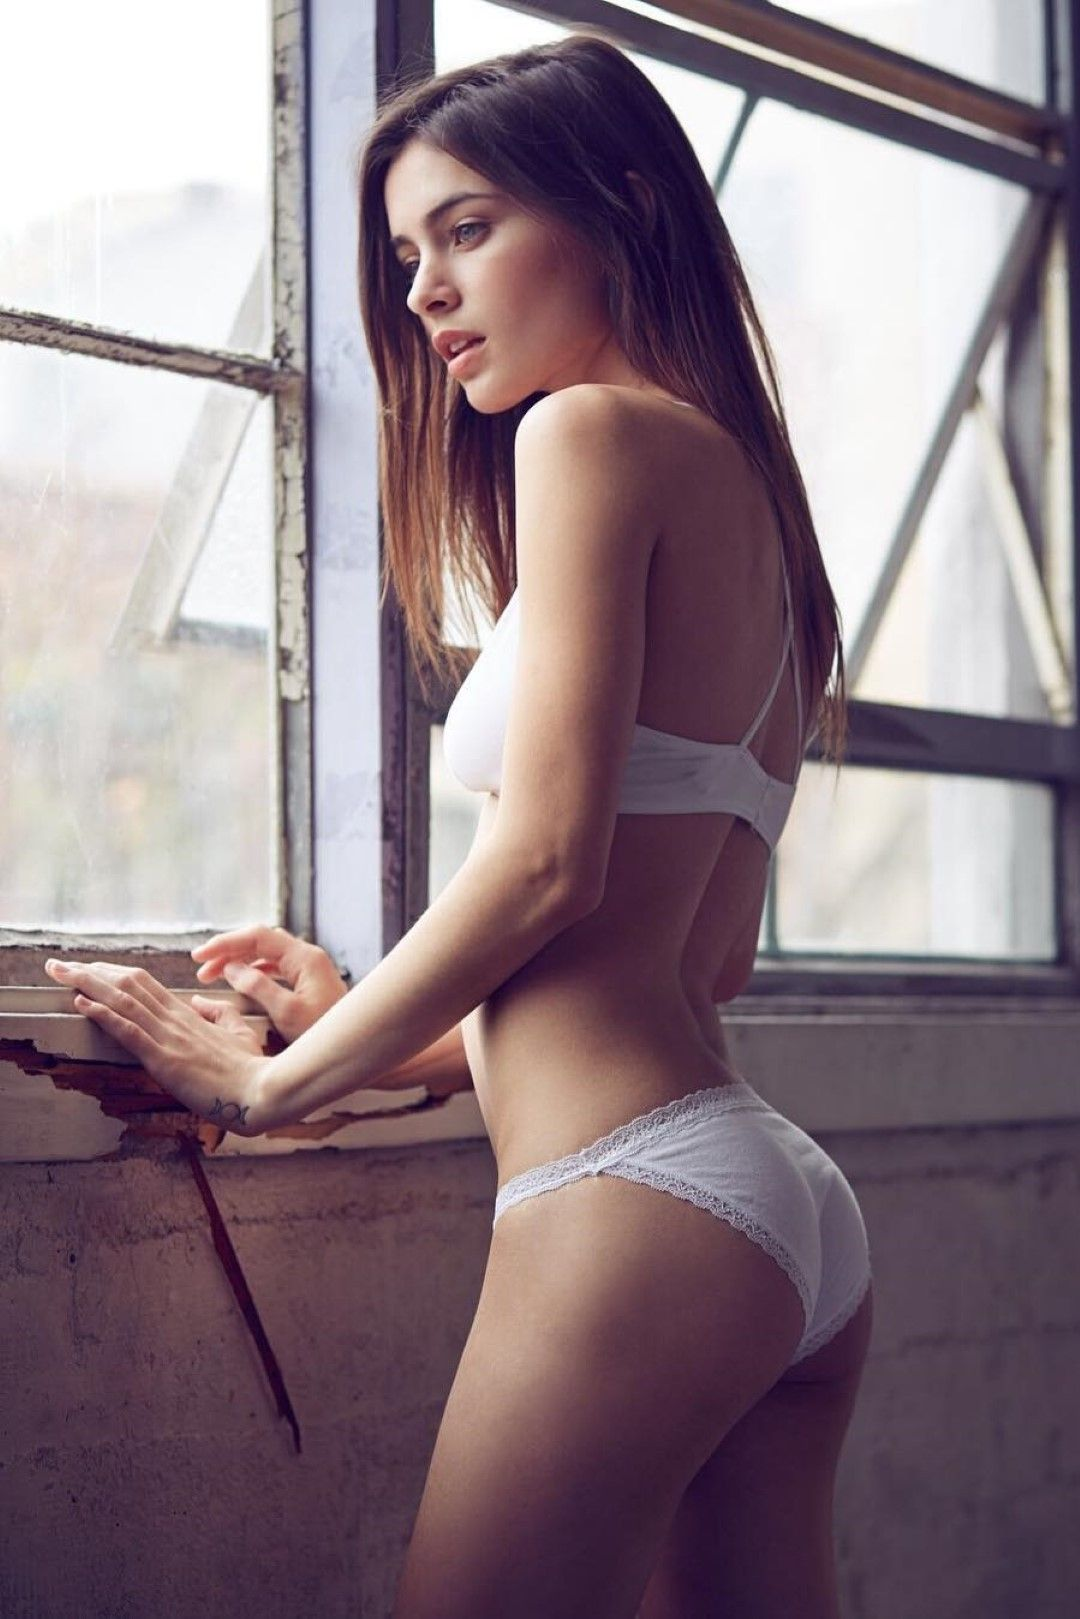 Whitecottonpanties Org Like Whitecottonpanties Org On Facebook Beauty Girls Beauty Women Read